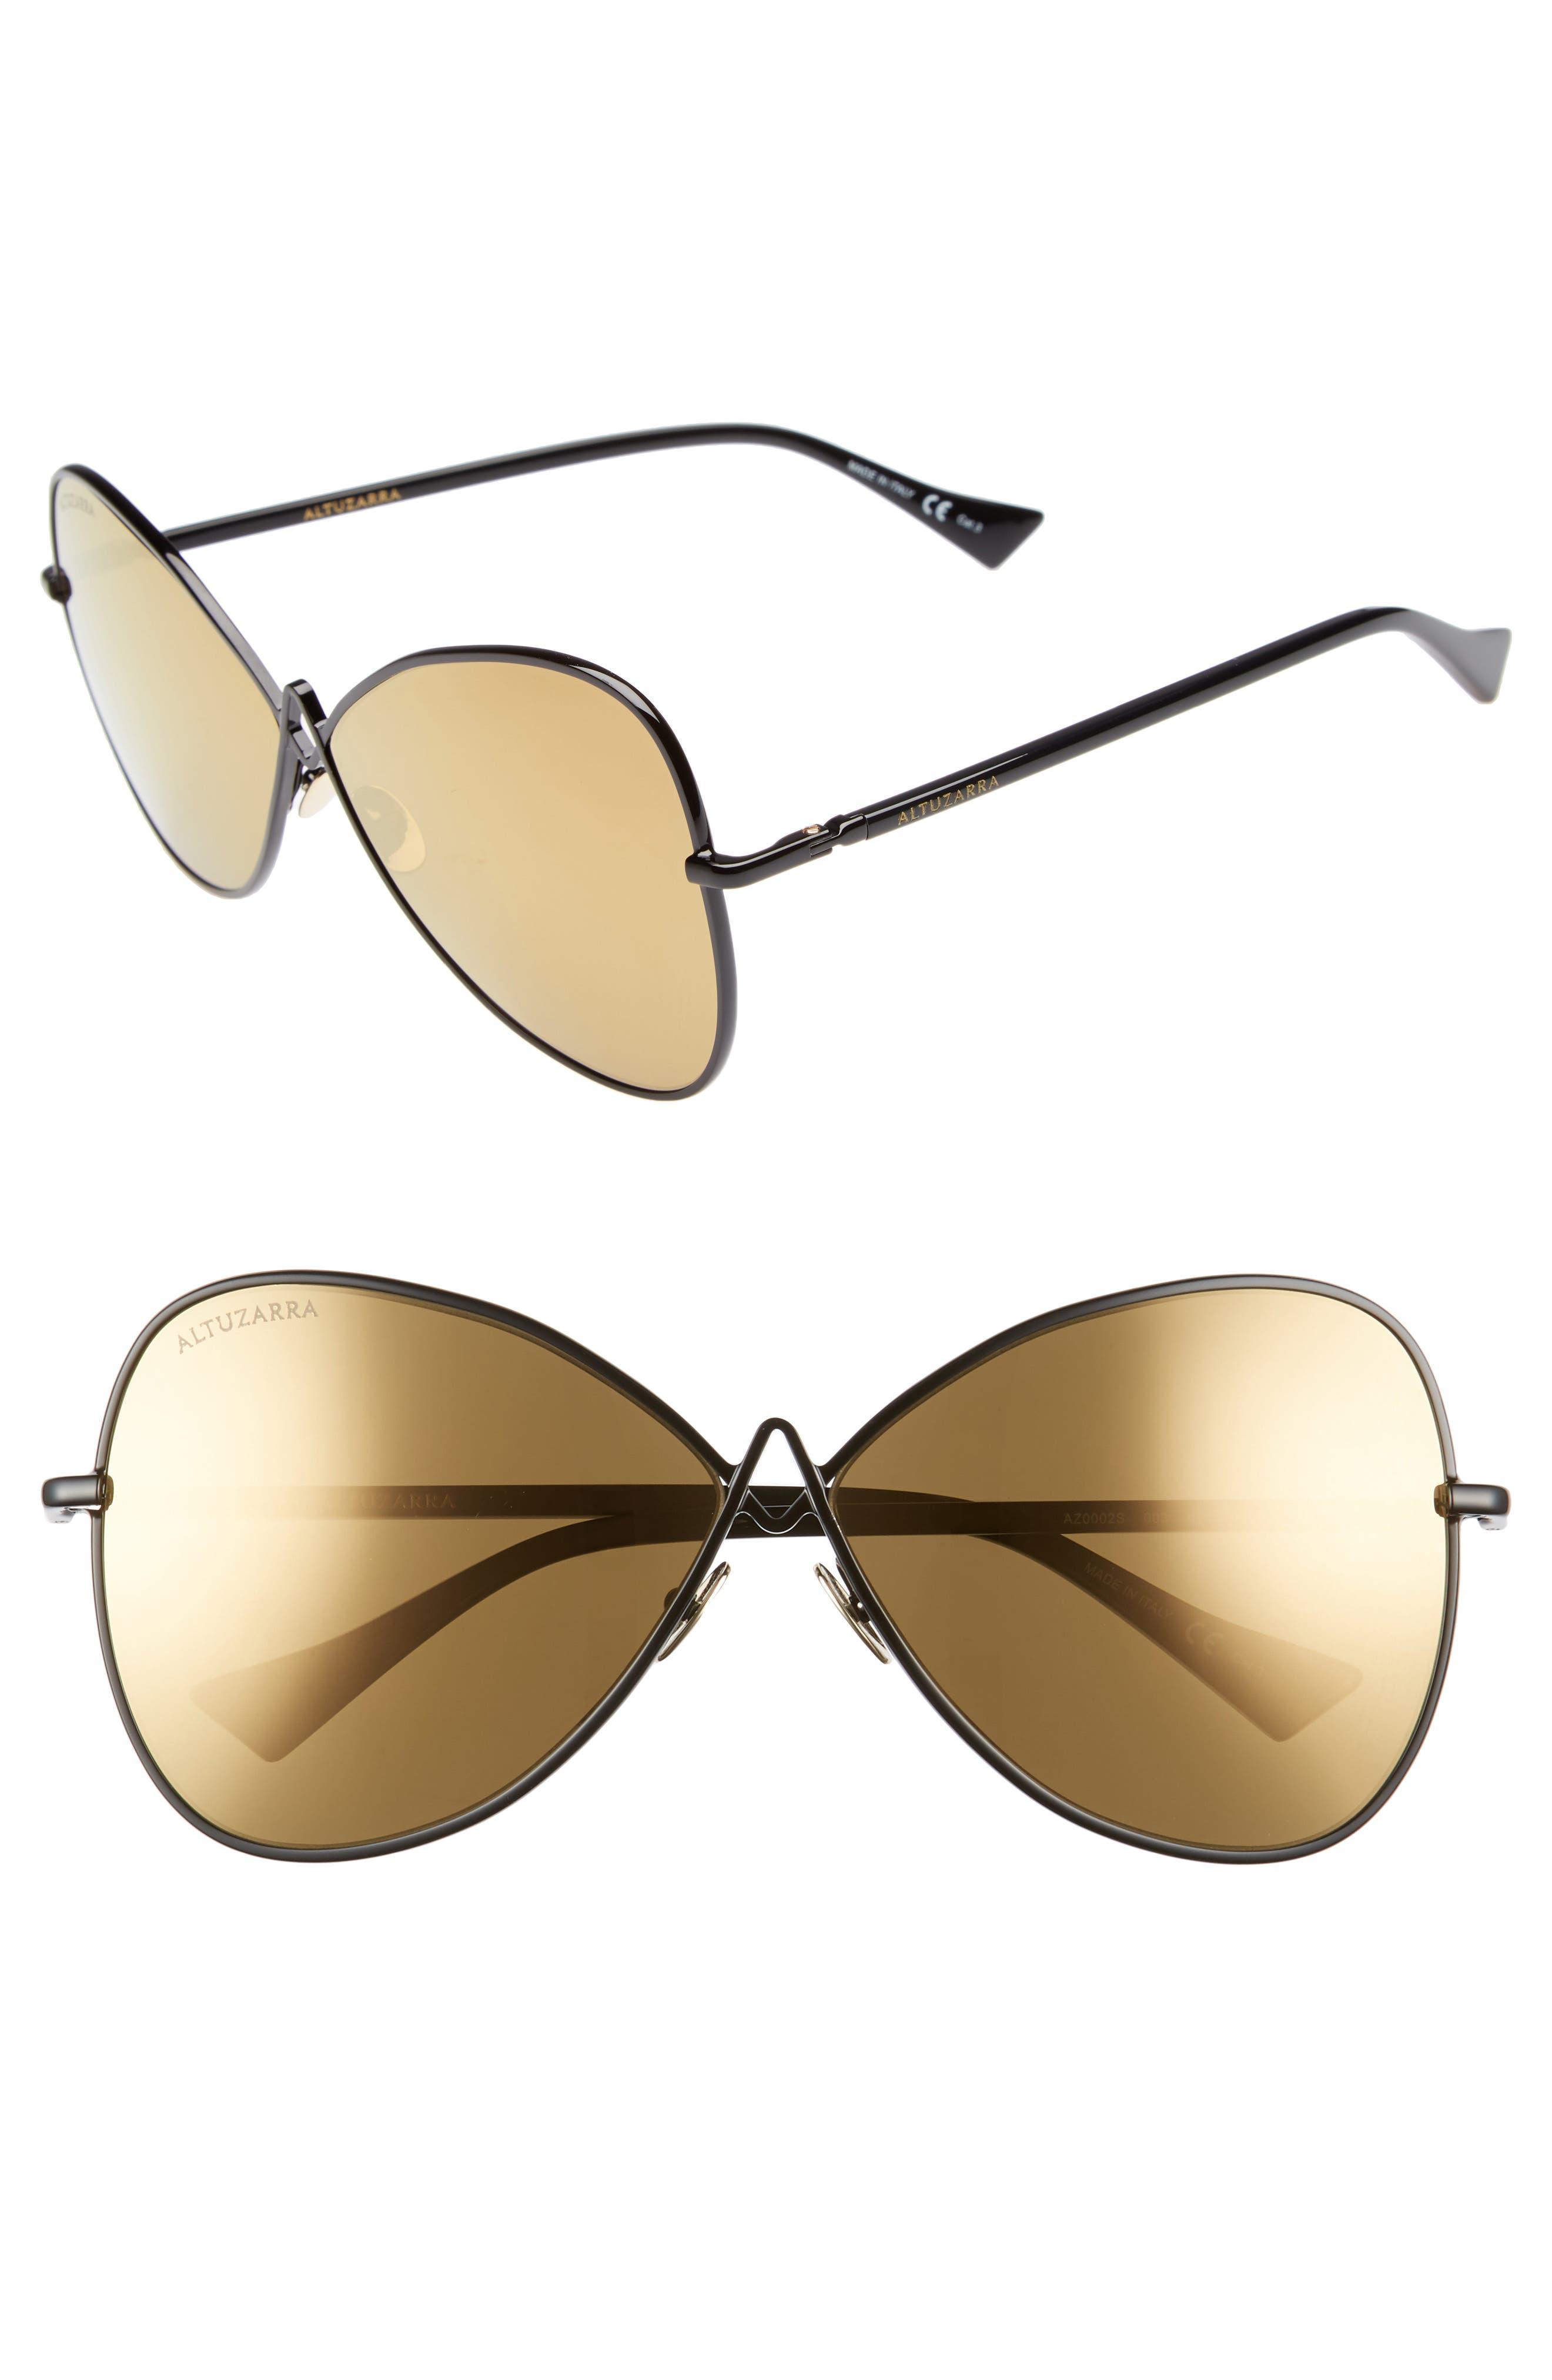 62mm Sunglasses,                         Main,                         color, BLACK